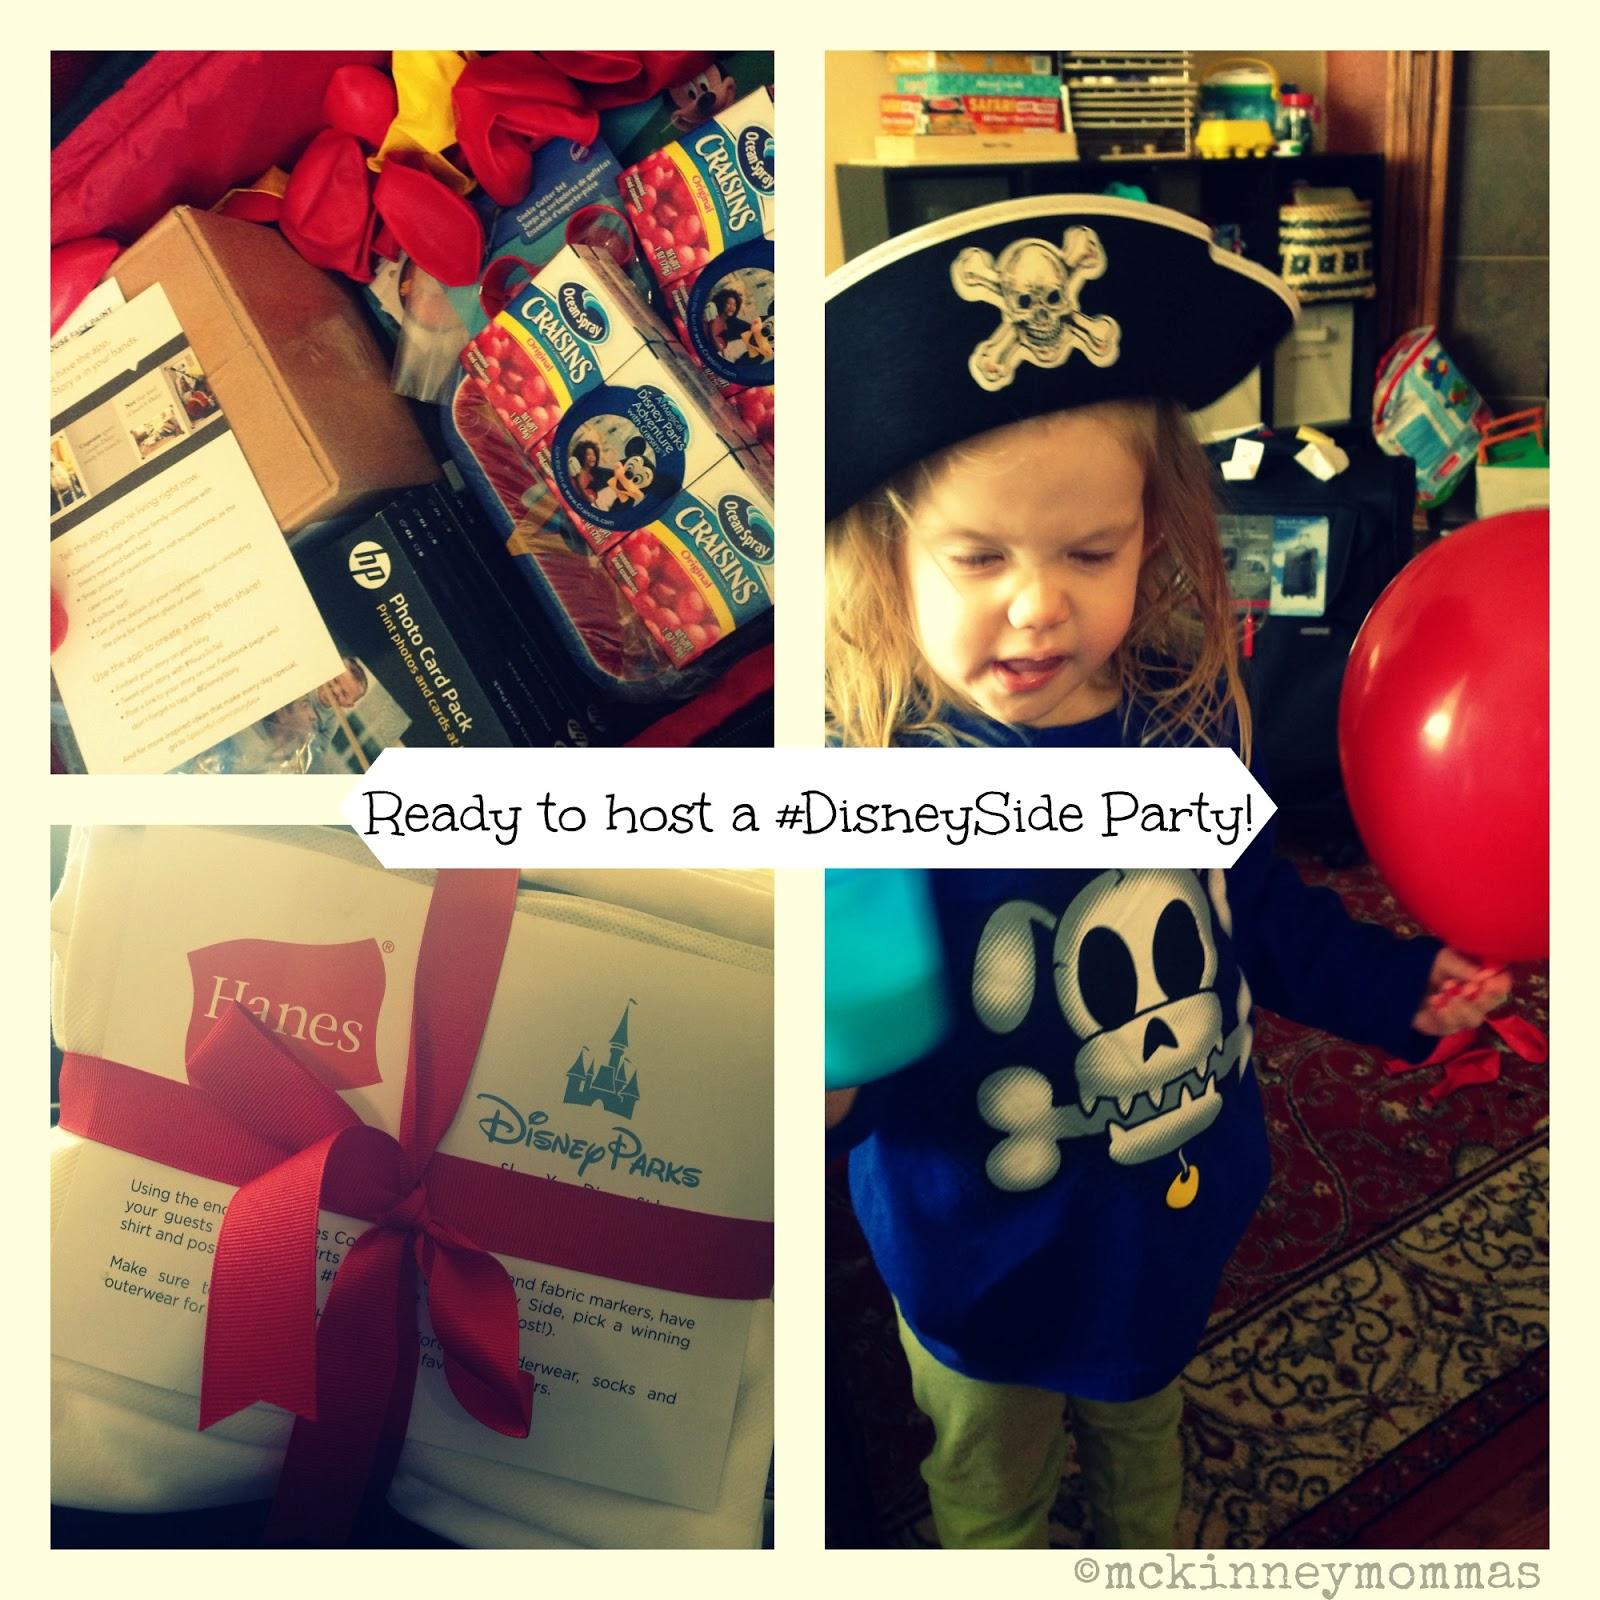 Pirate Girl #DisneySide